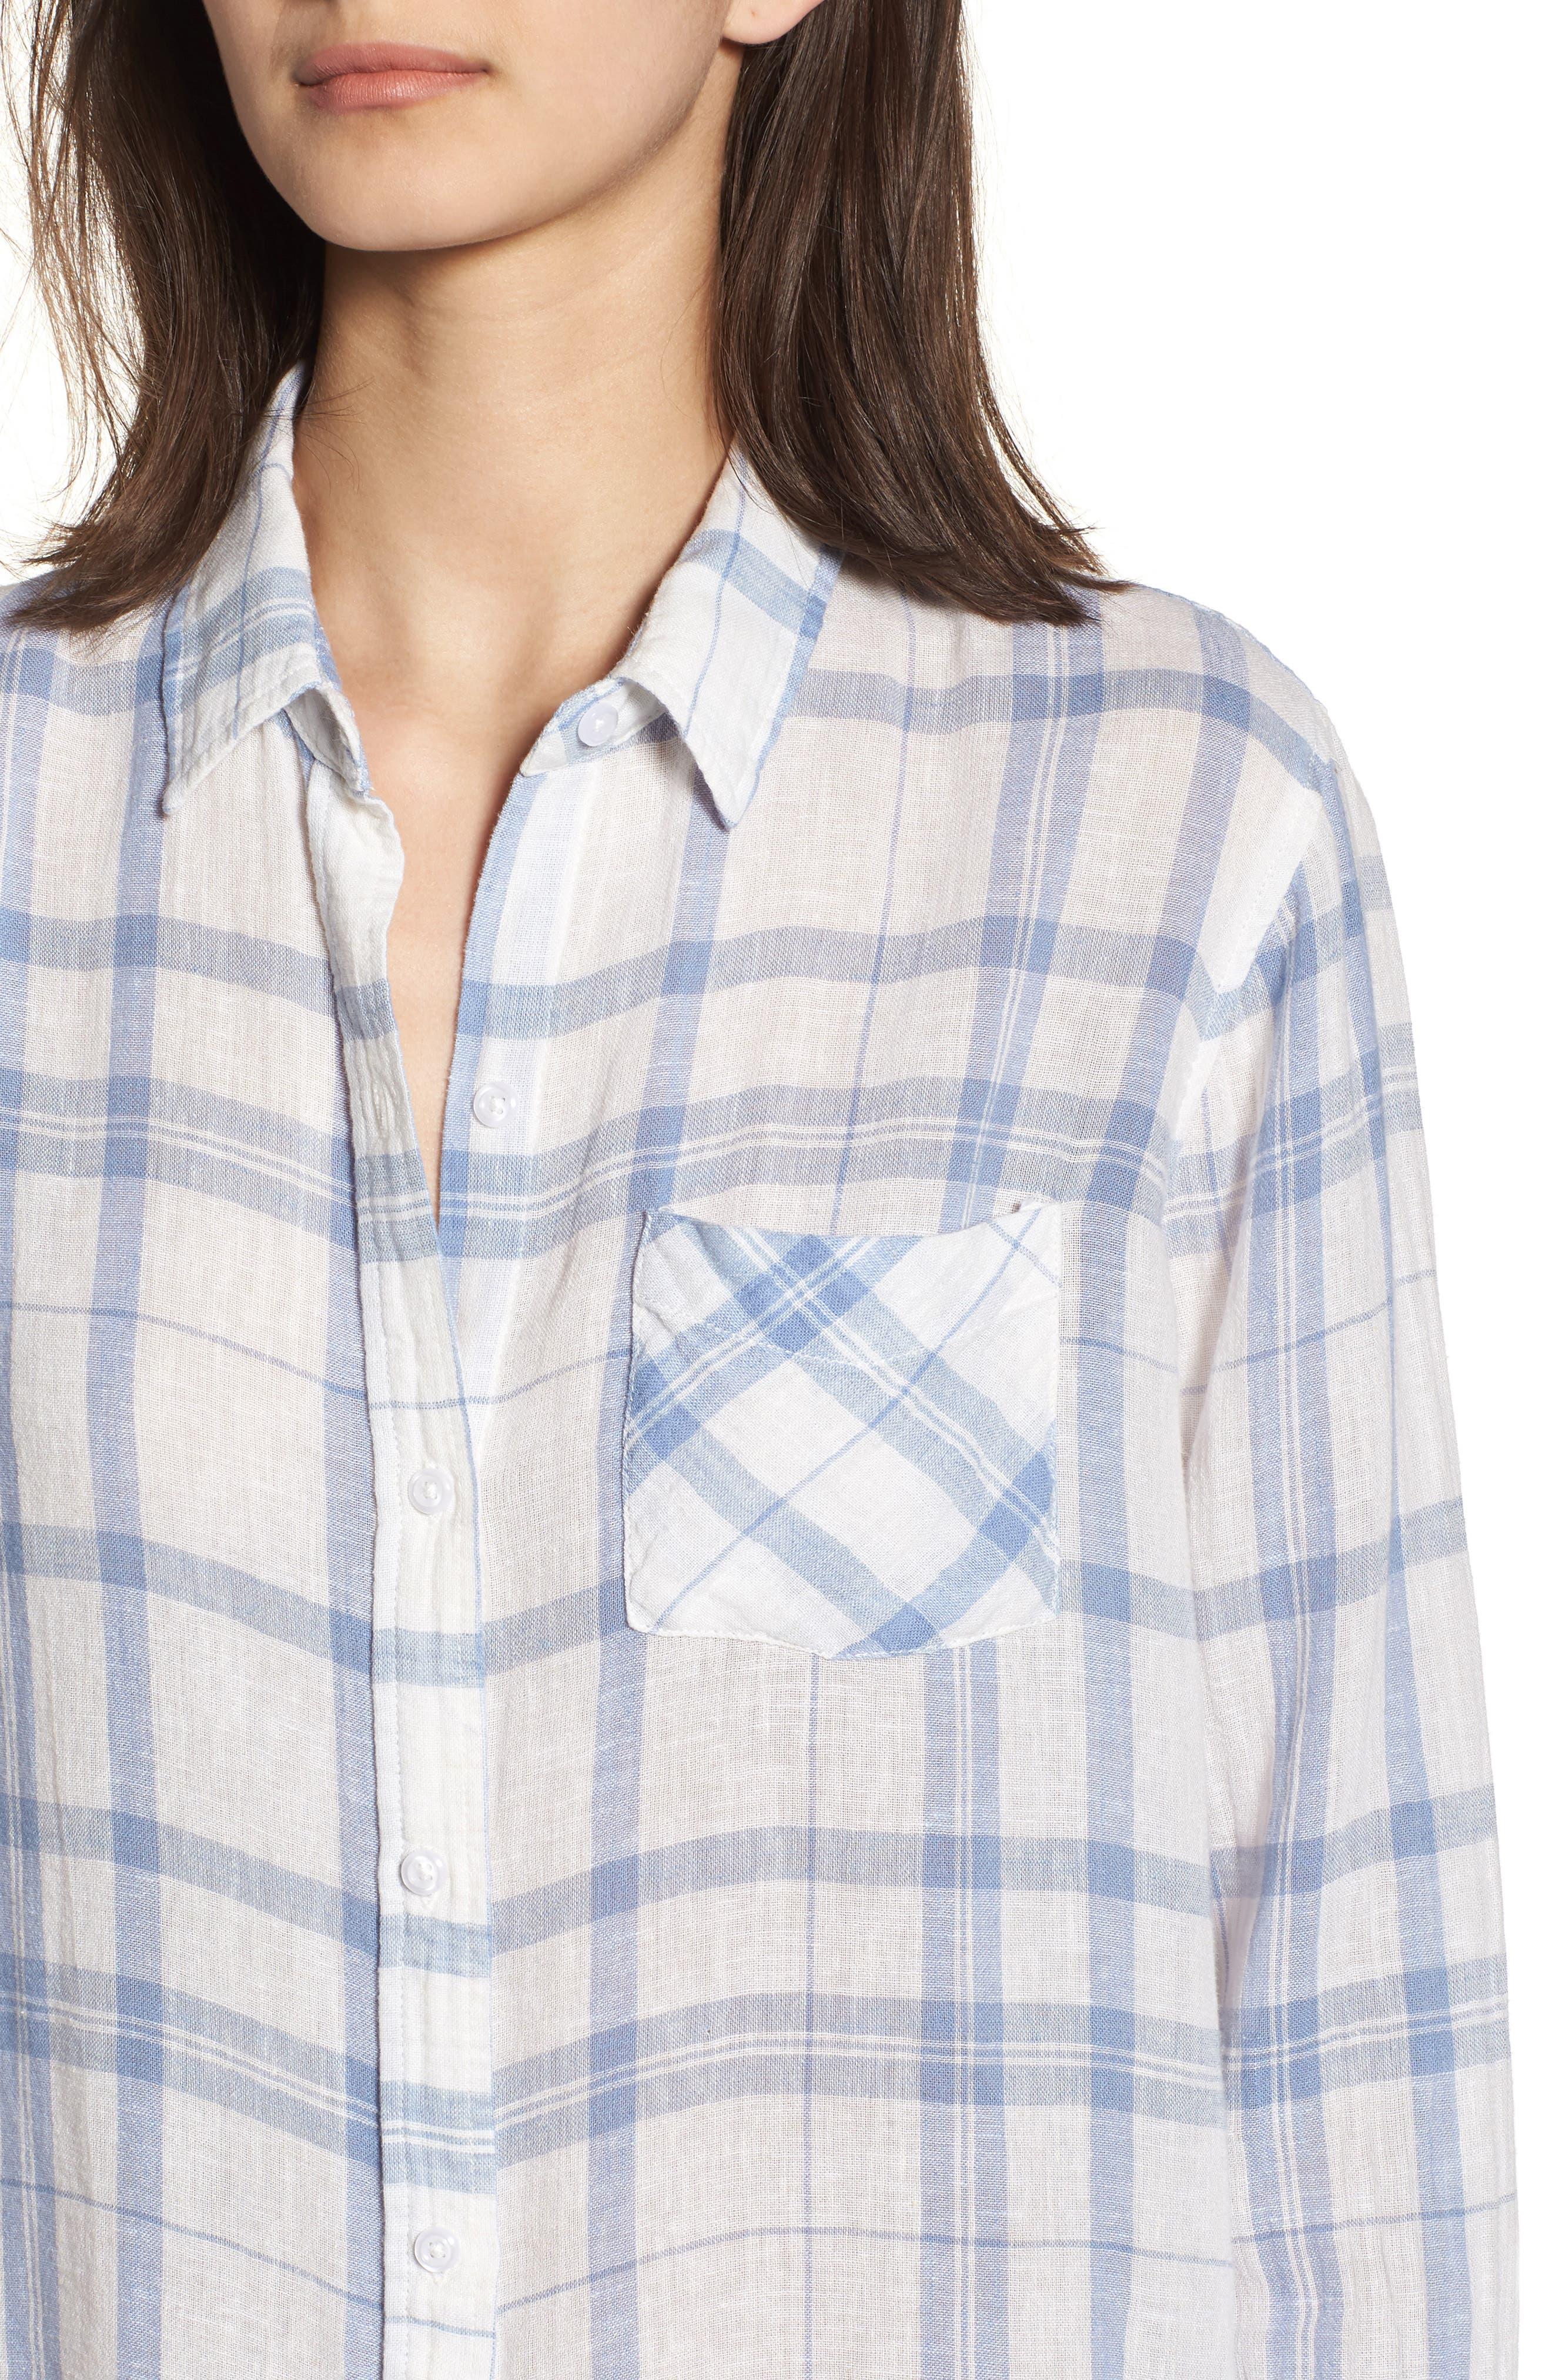 Charli Shirt,                             Alternate thumbnail 4, color,                             TRUE BLUE WHITE